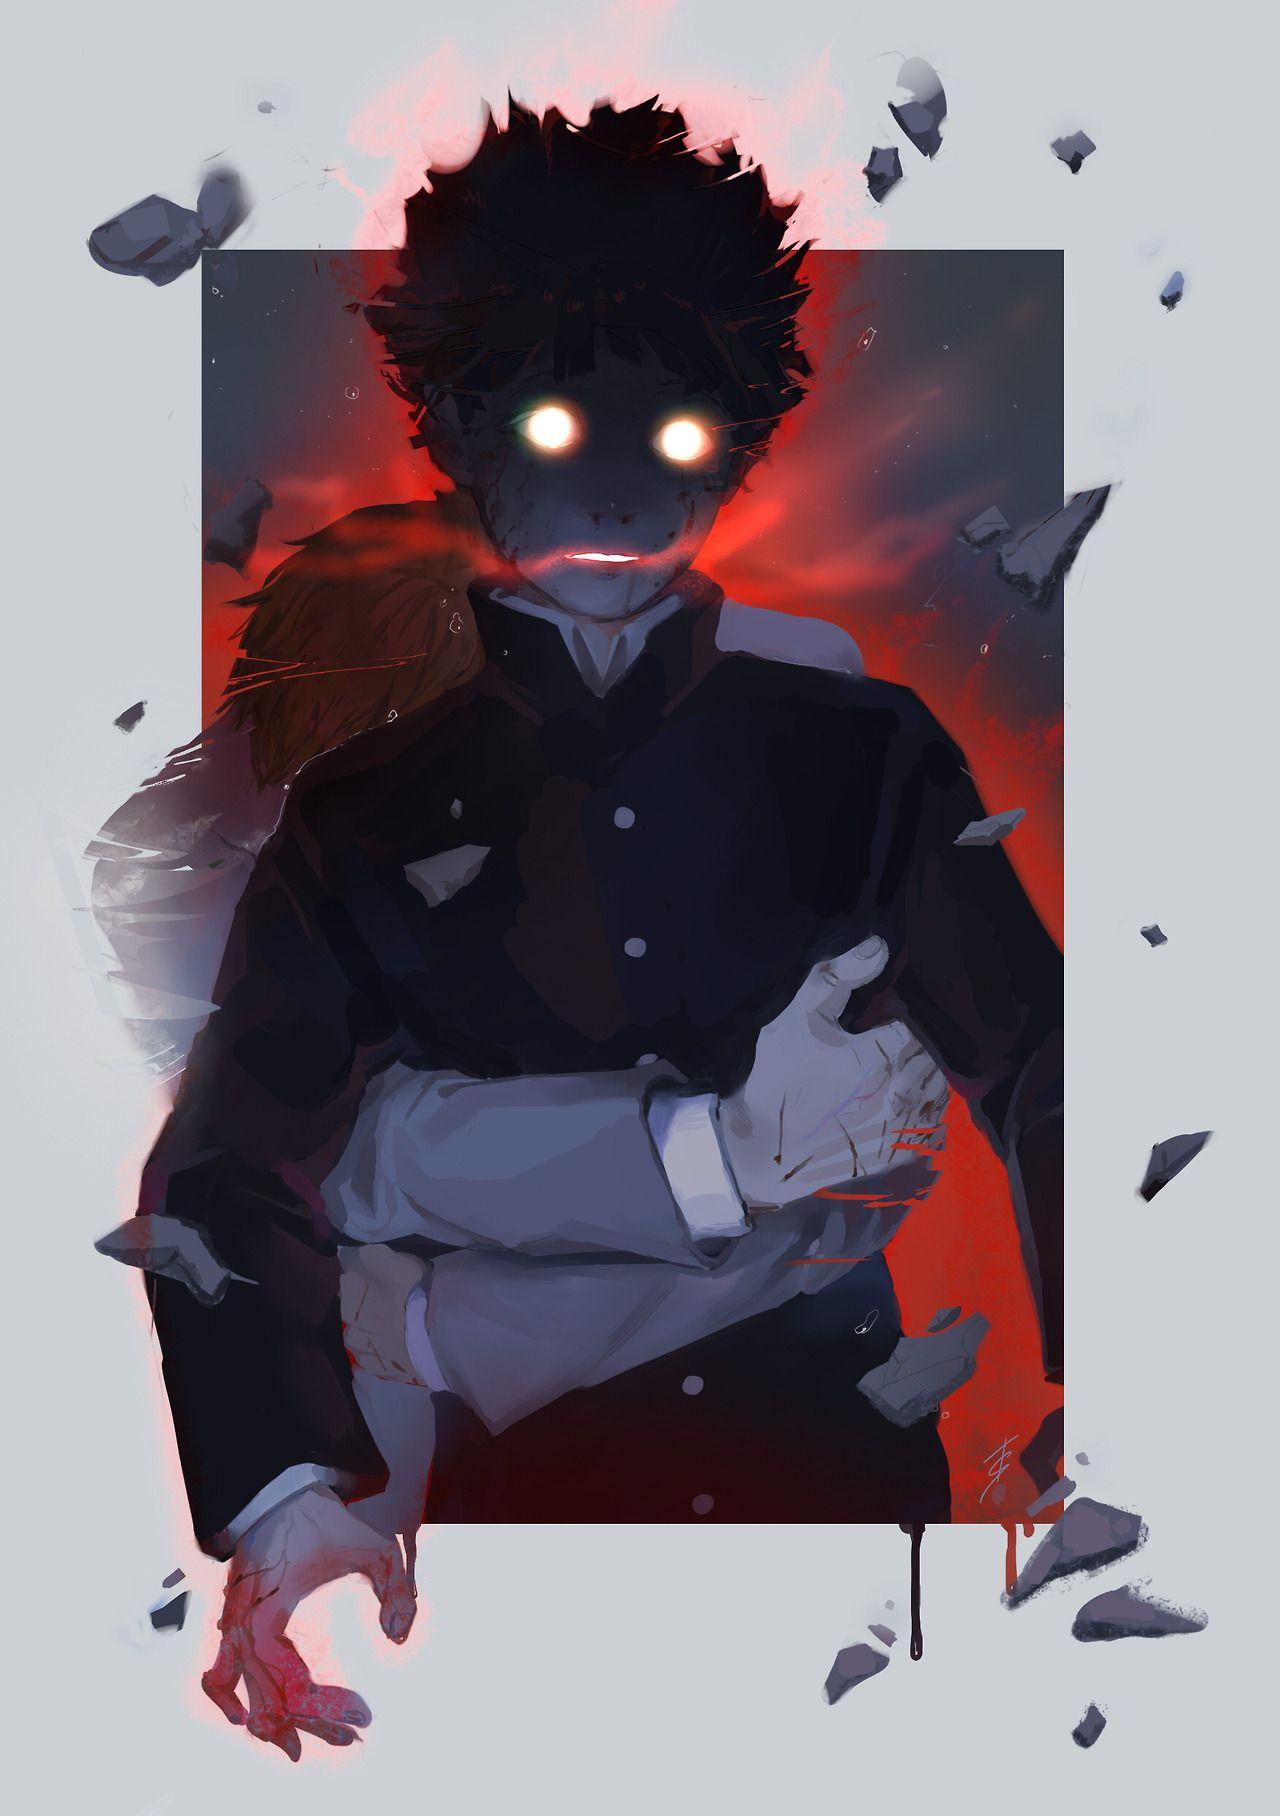 takanodem Mob psycho 100 anime, Mob psycho 100, Mob psycho